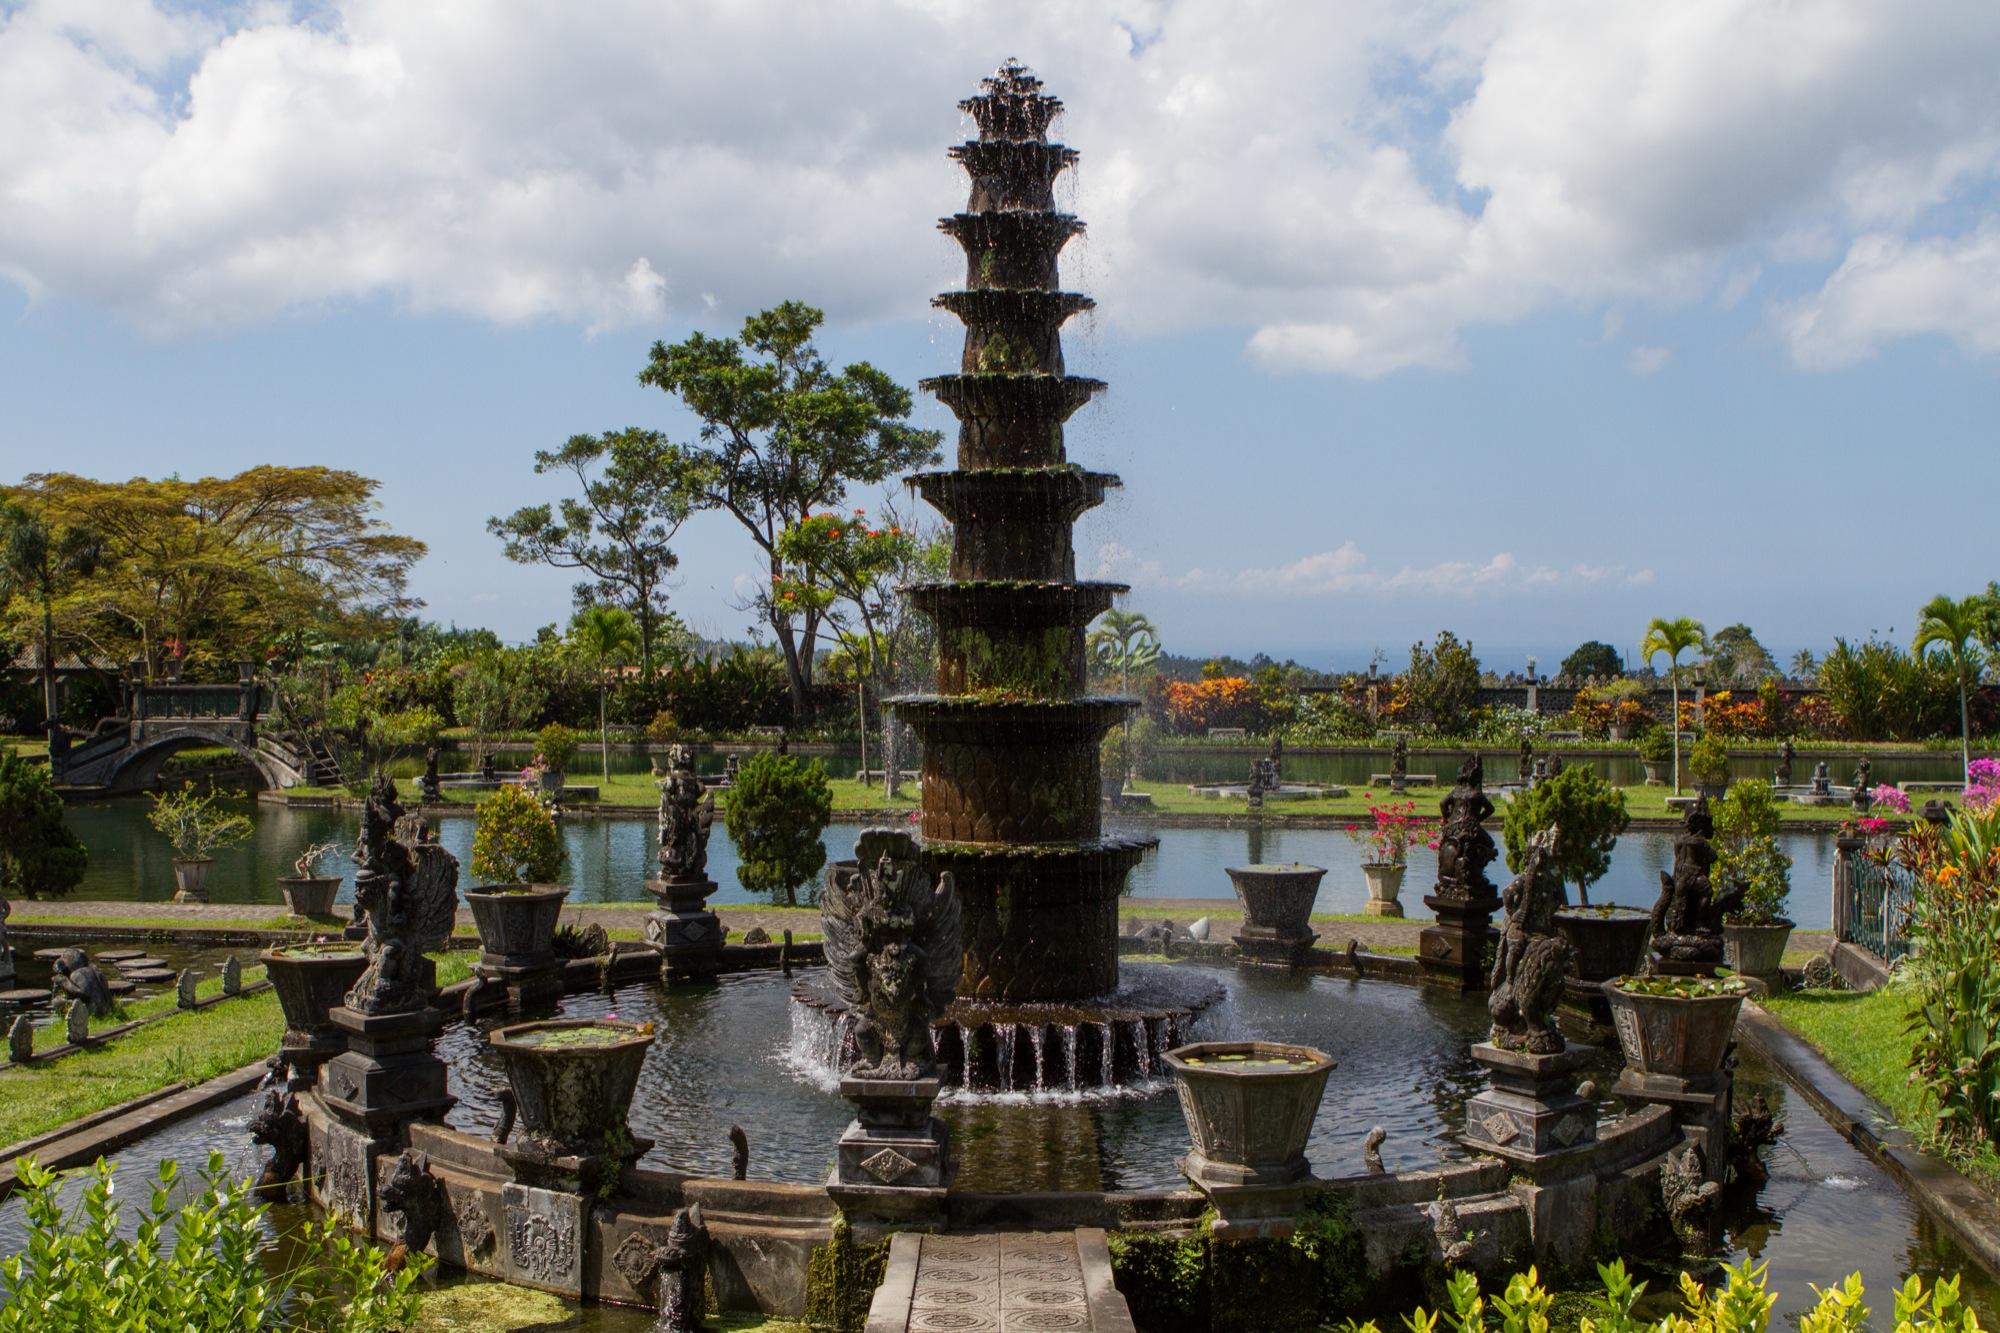 voyage-indonesie-tirgagangga-19